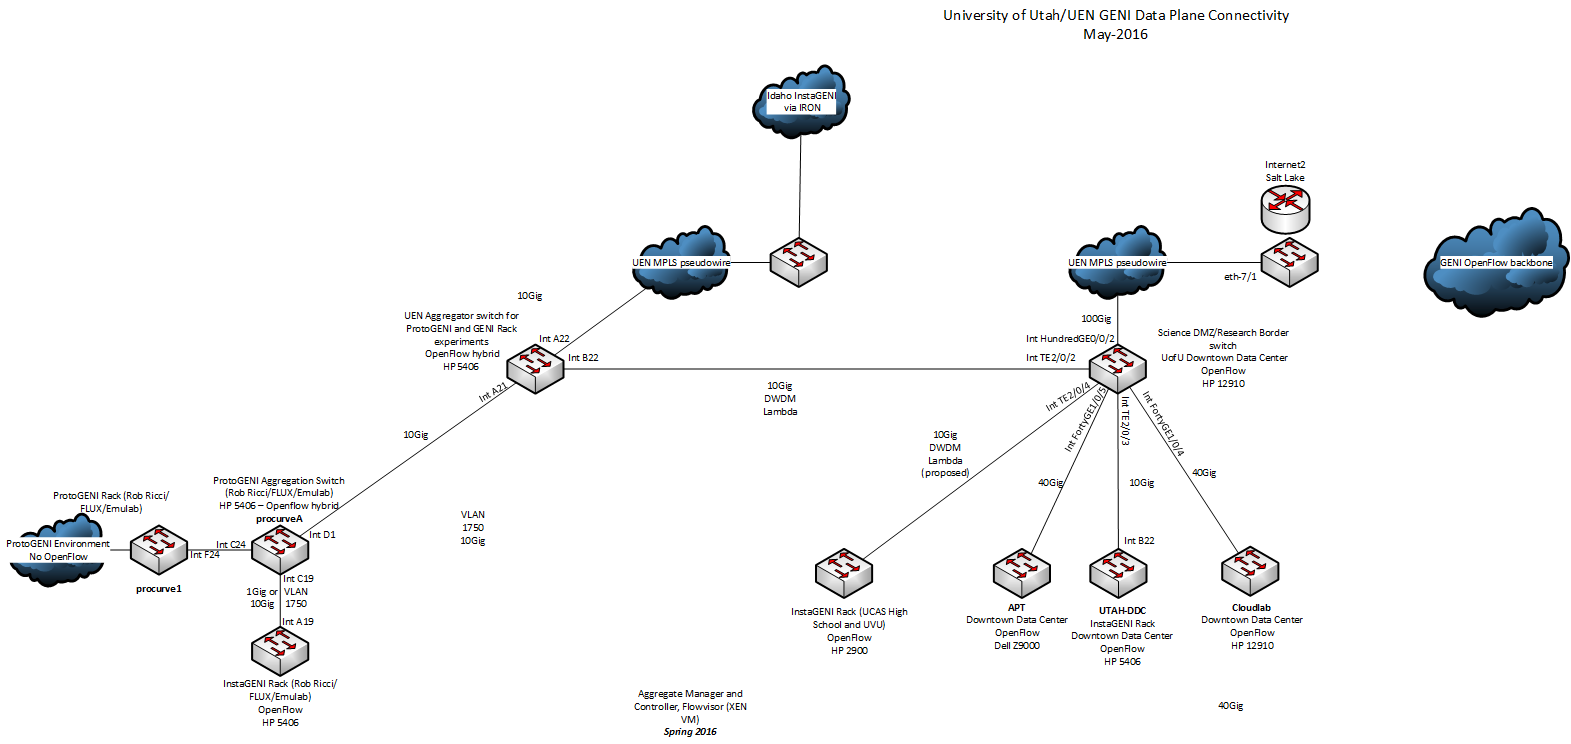 Utahoverview geni geni uen geni connectivity diagram 05 2016 publicscrutiny Images